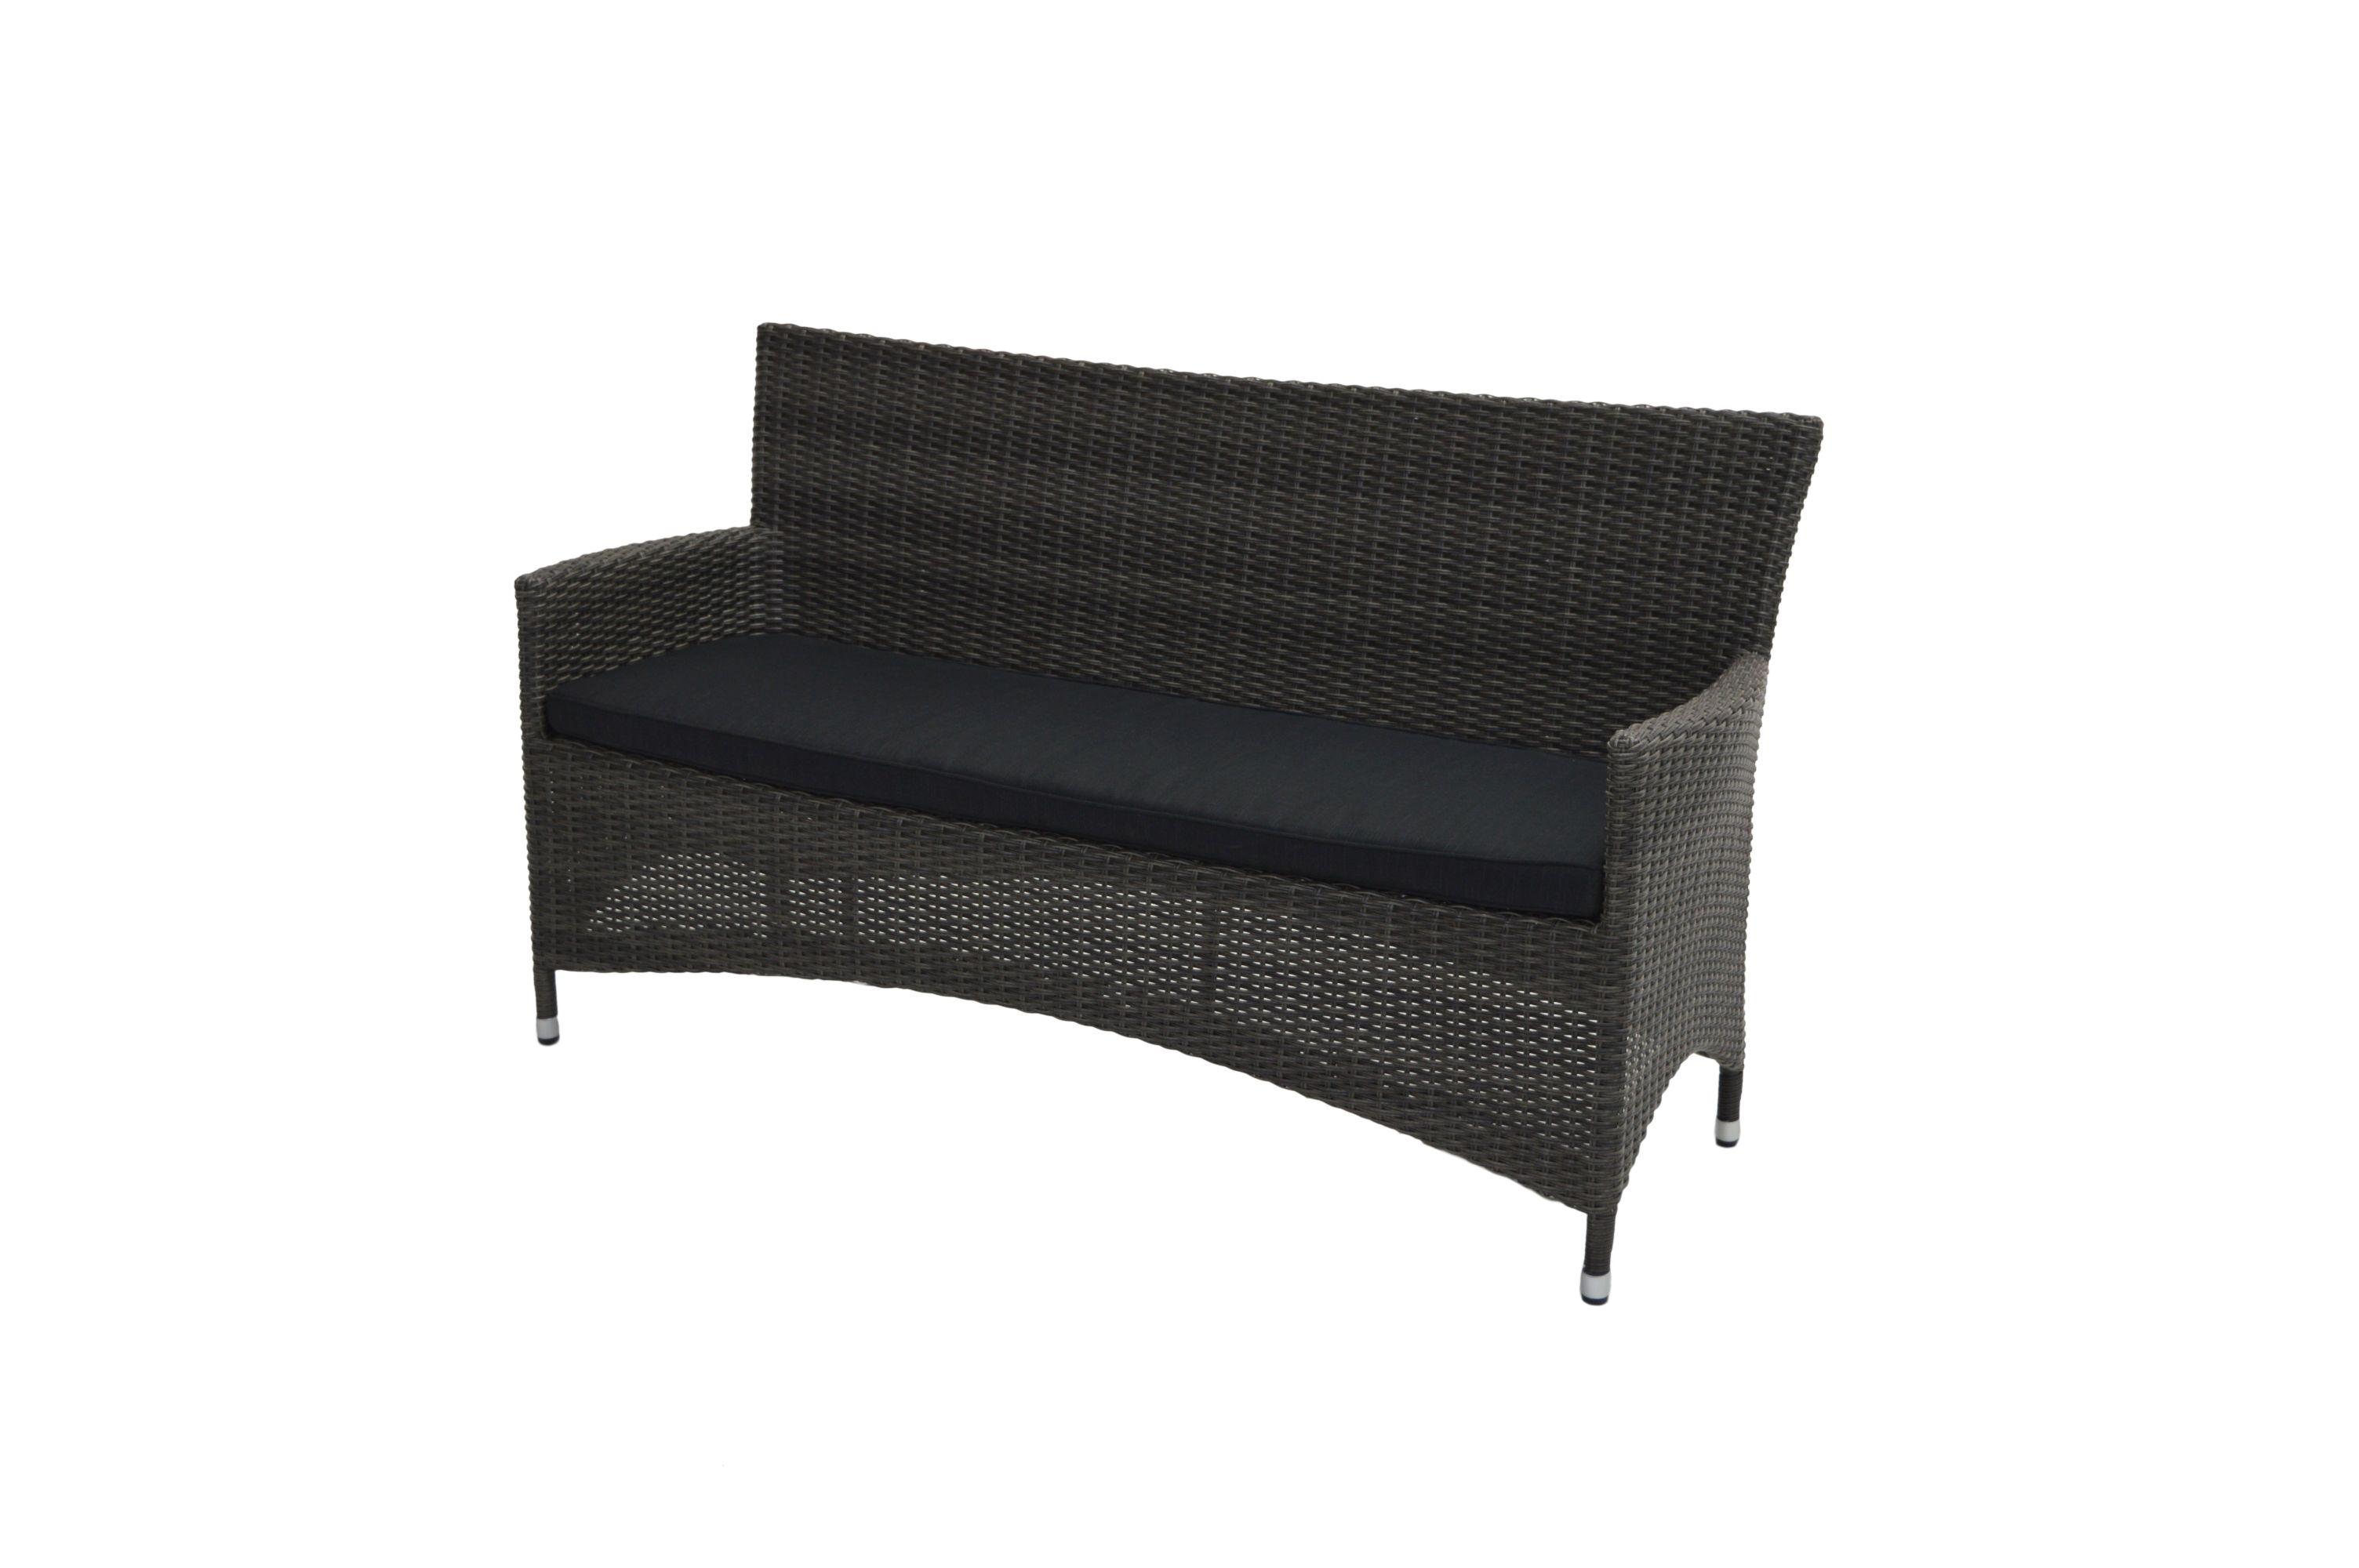 bank rocking basic 165cm polyrattangelfecht gartenb nke. Black Bedroom Furniture Sets. Home Design Ideas